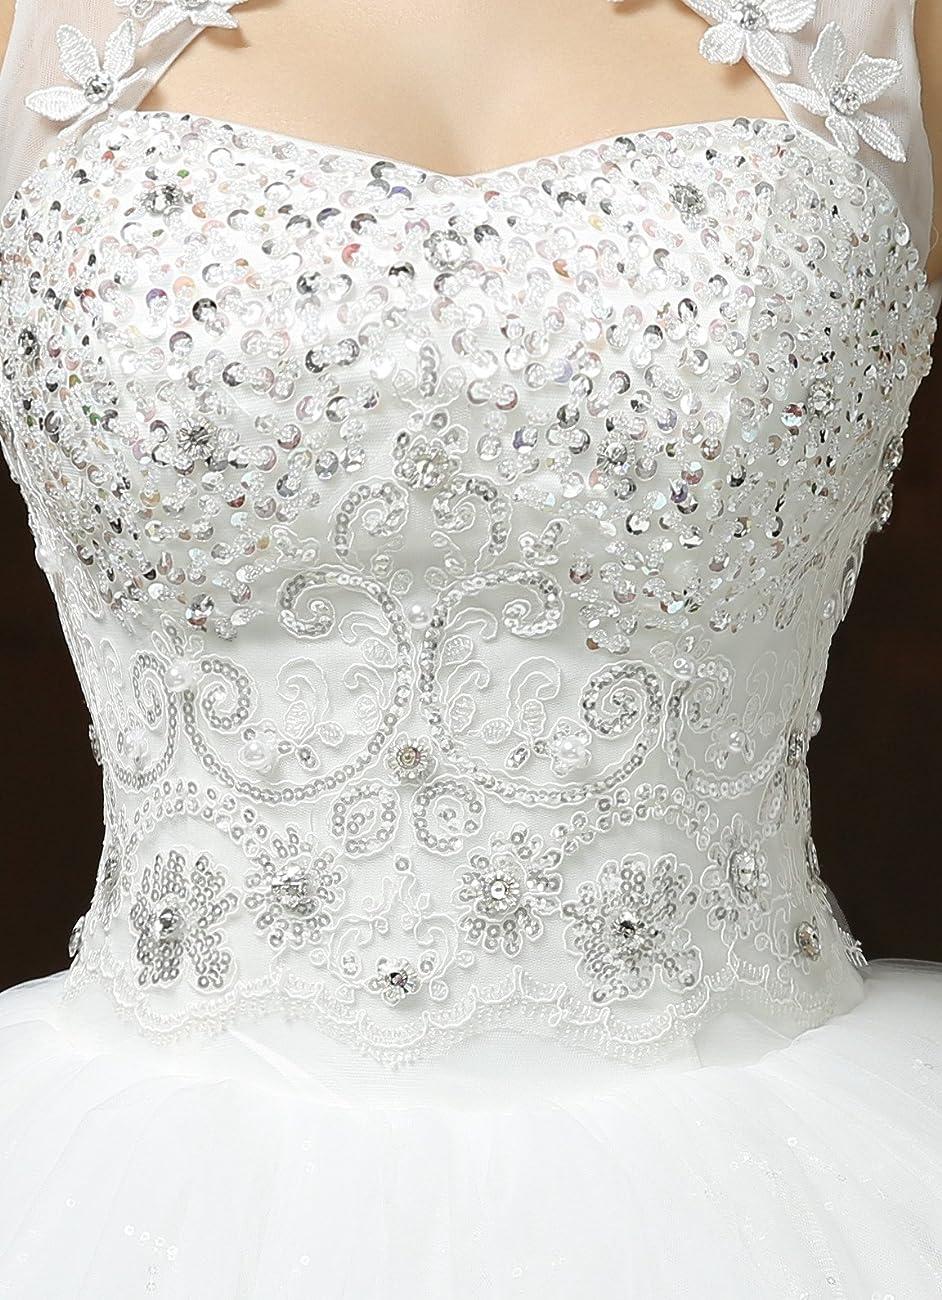 Clover Bridal Vintage High Collar Pearl Wedding Dress for Bride White Under 100 3